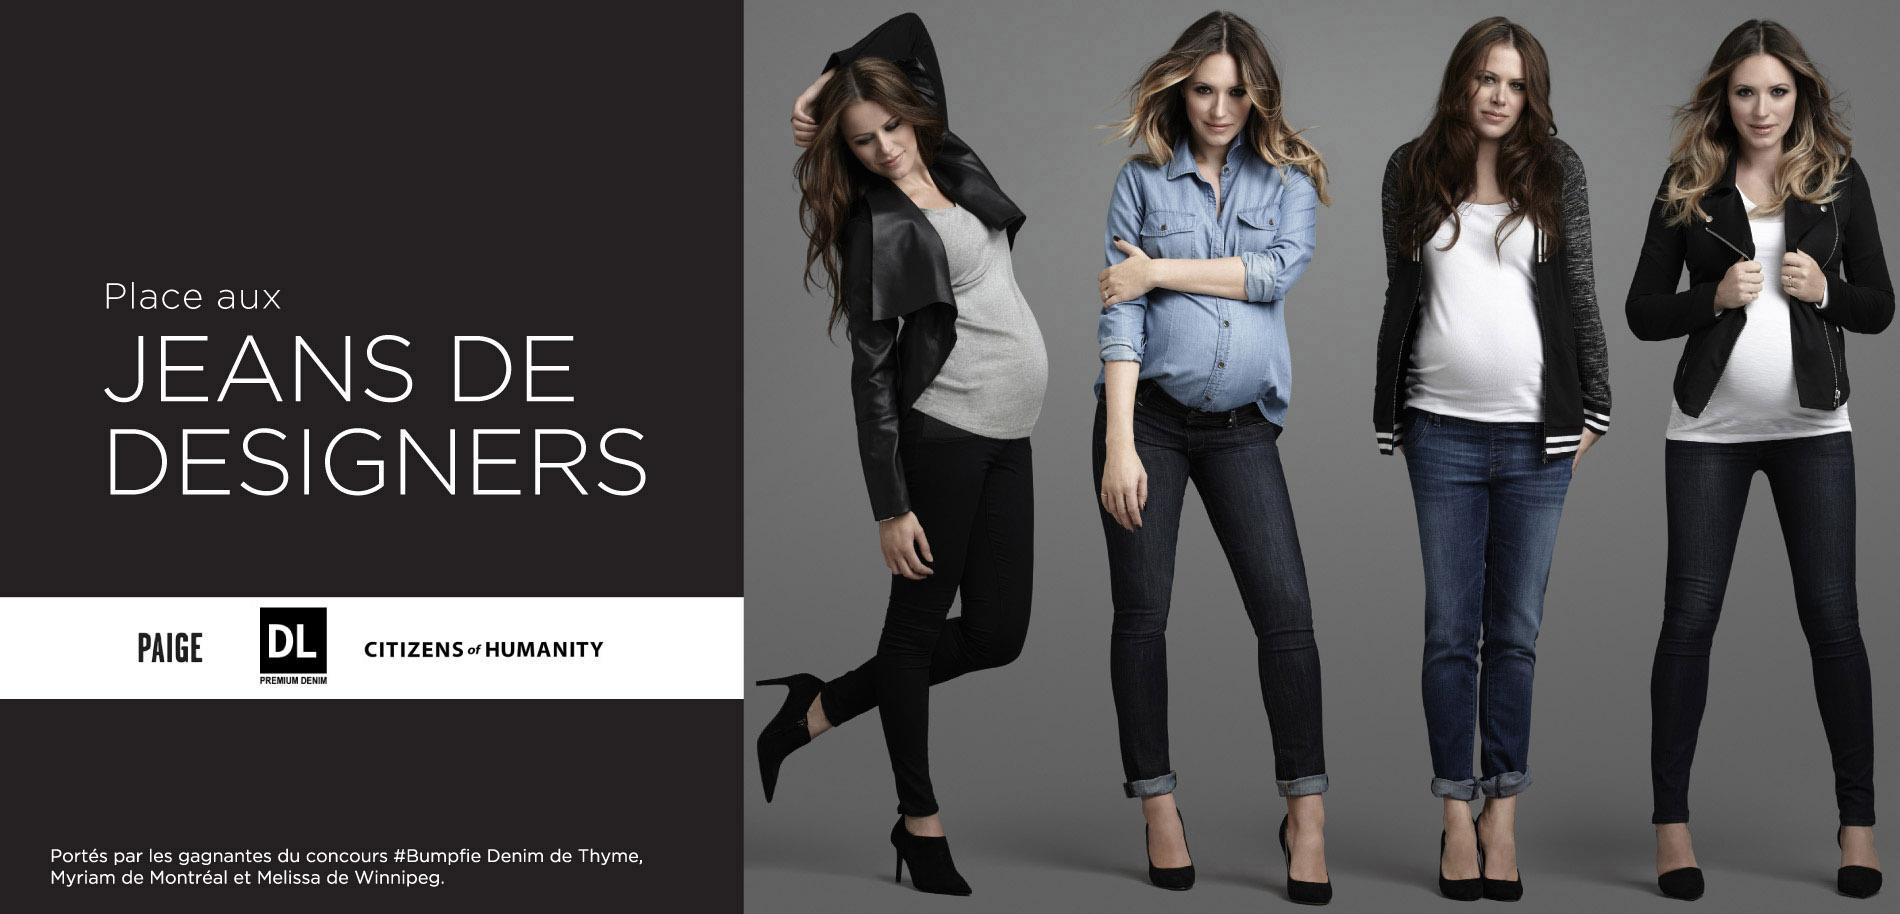 Jeans de designers slide 1